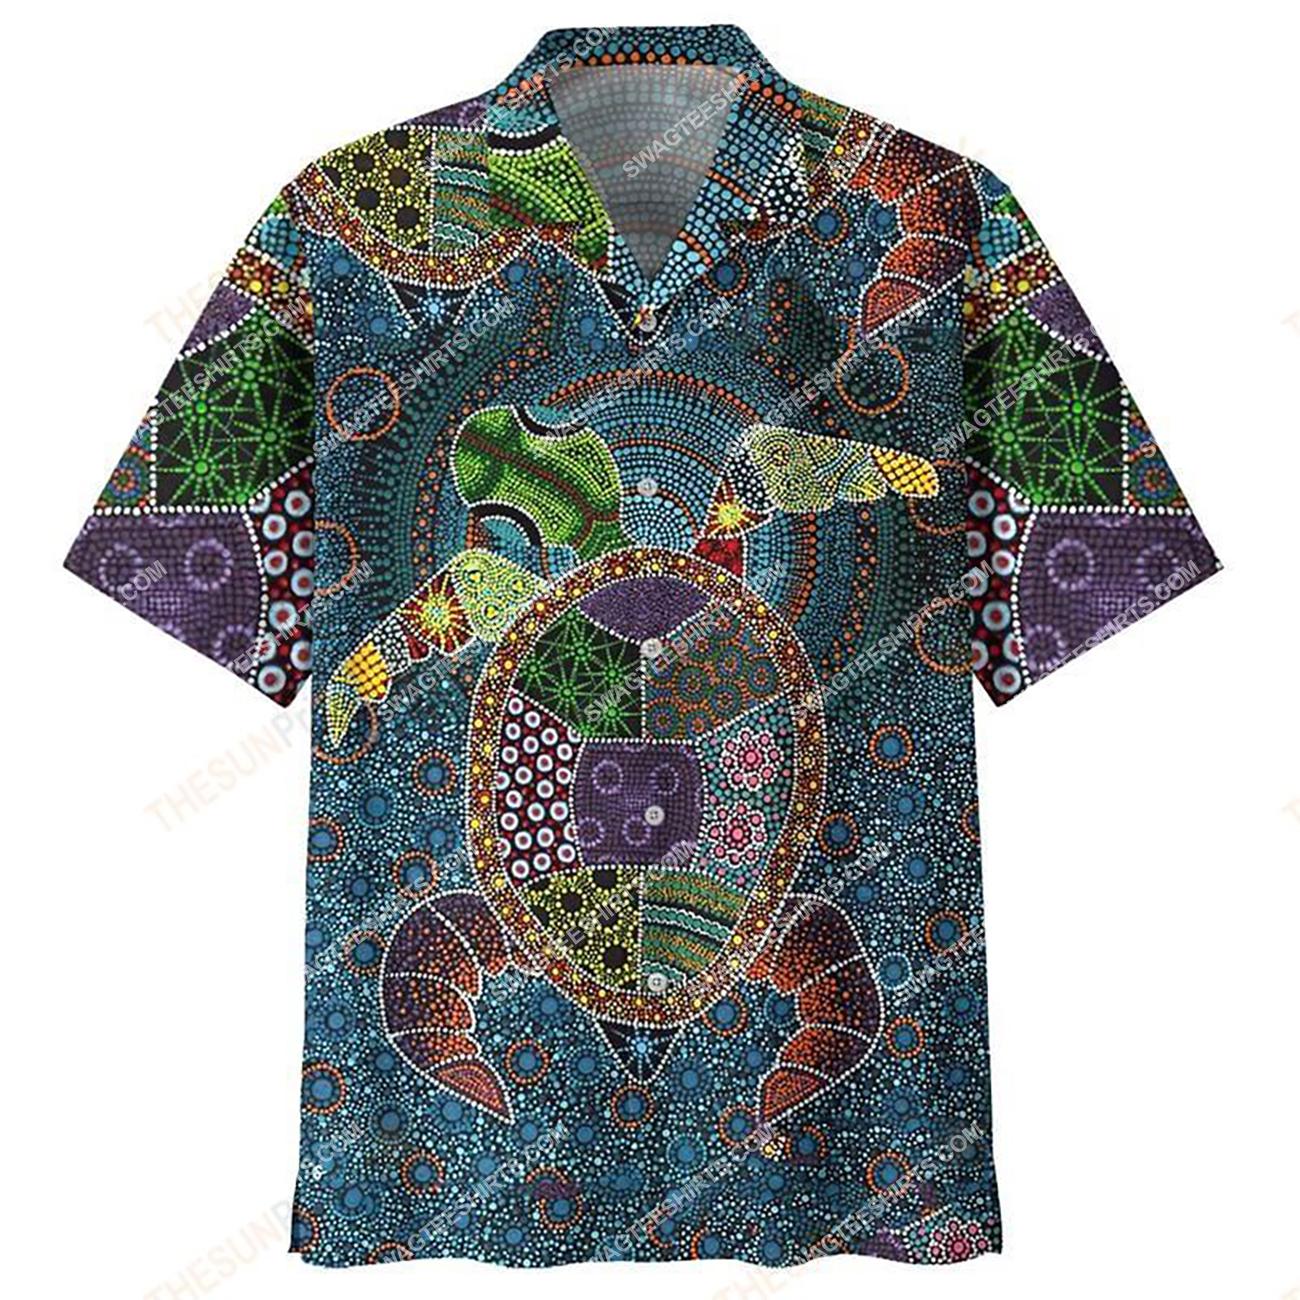 vintage sea turtle all over printed hawaiian shirt 1(1)